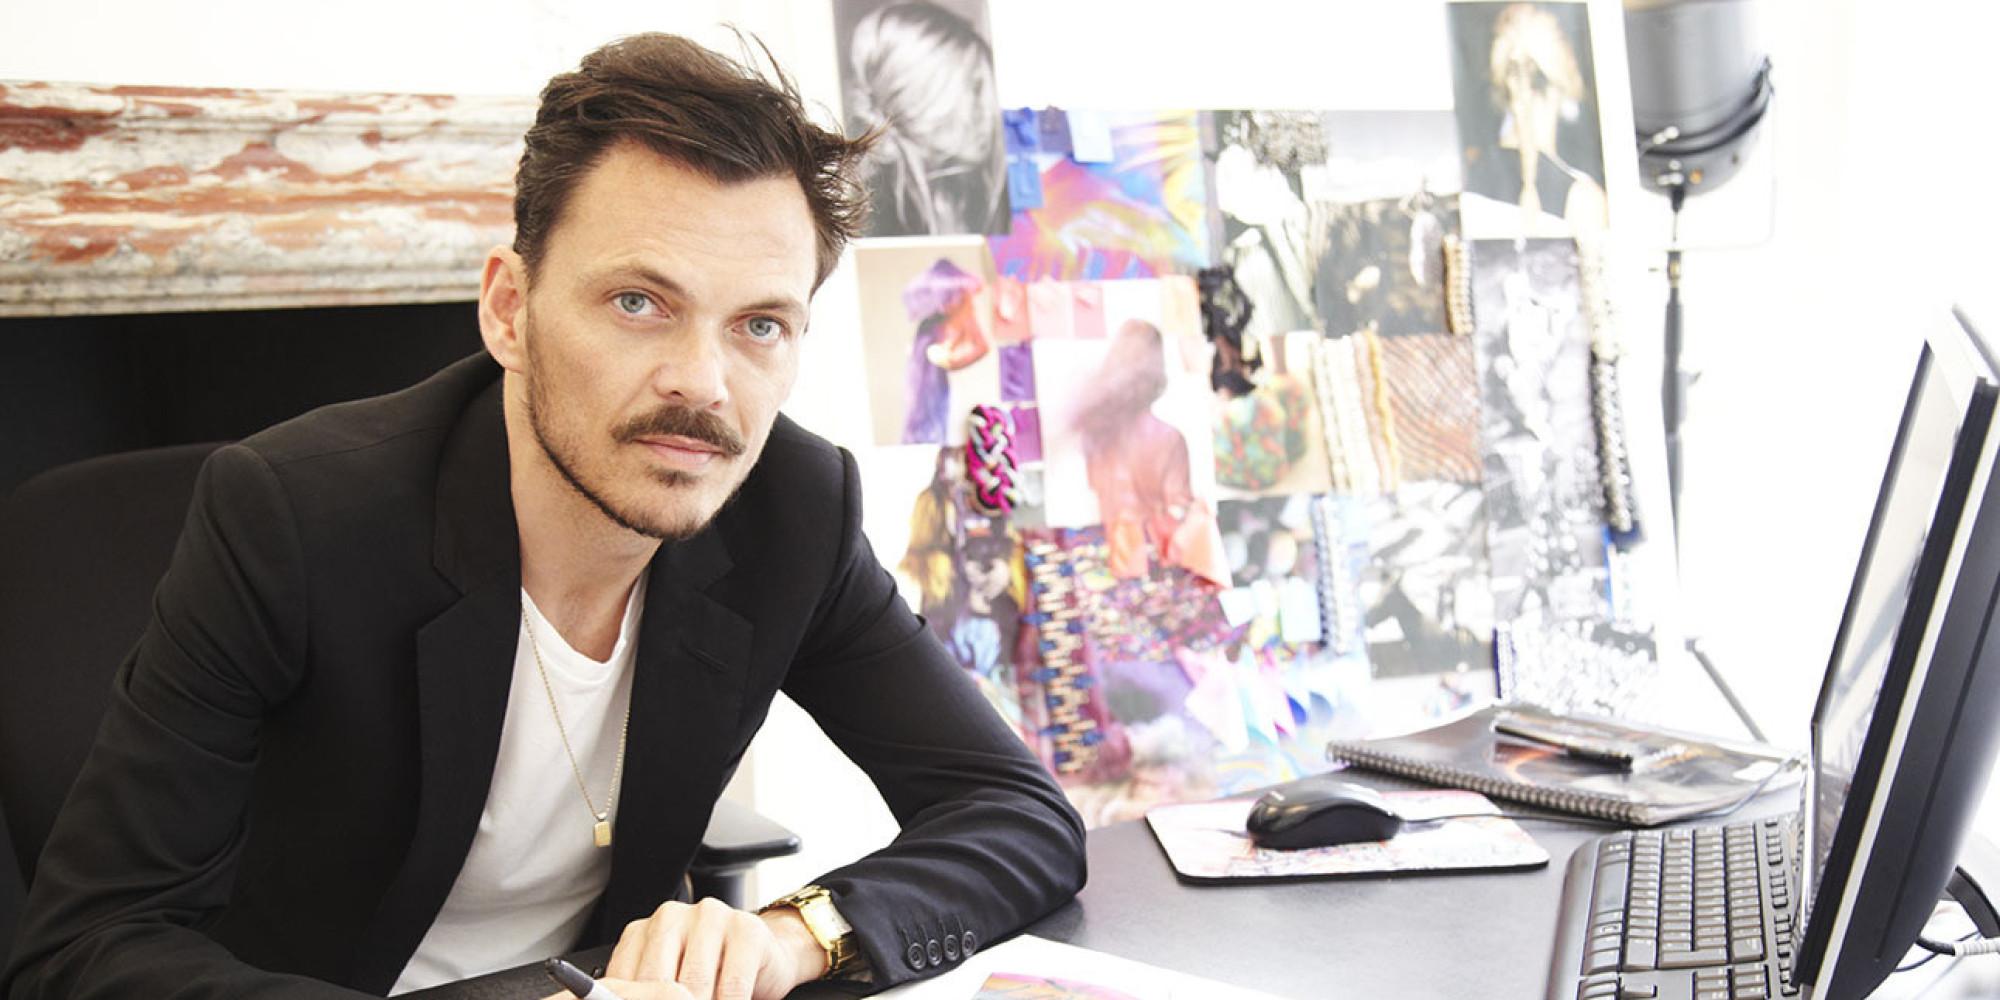 Man Of The Hour: British Fashion Designer Matthew Williamson On ...